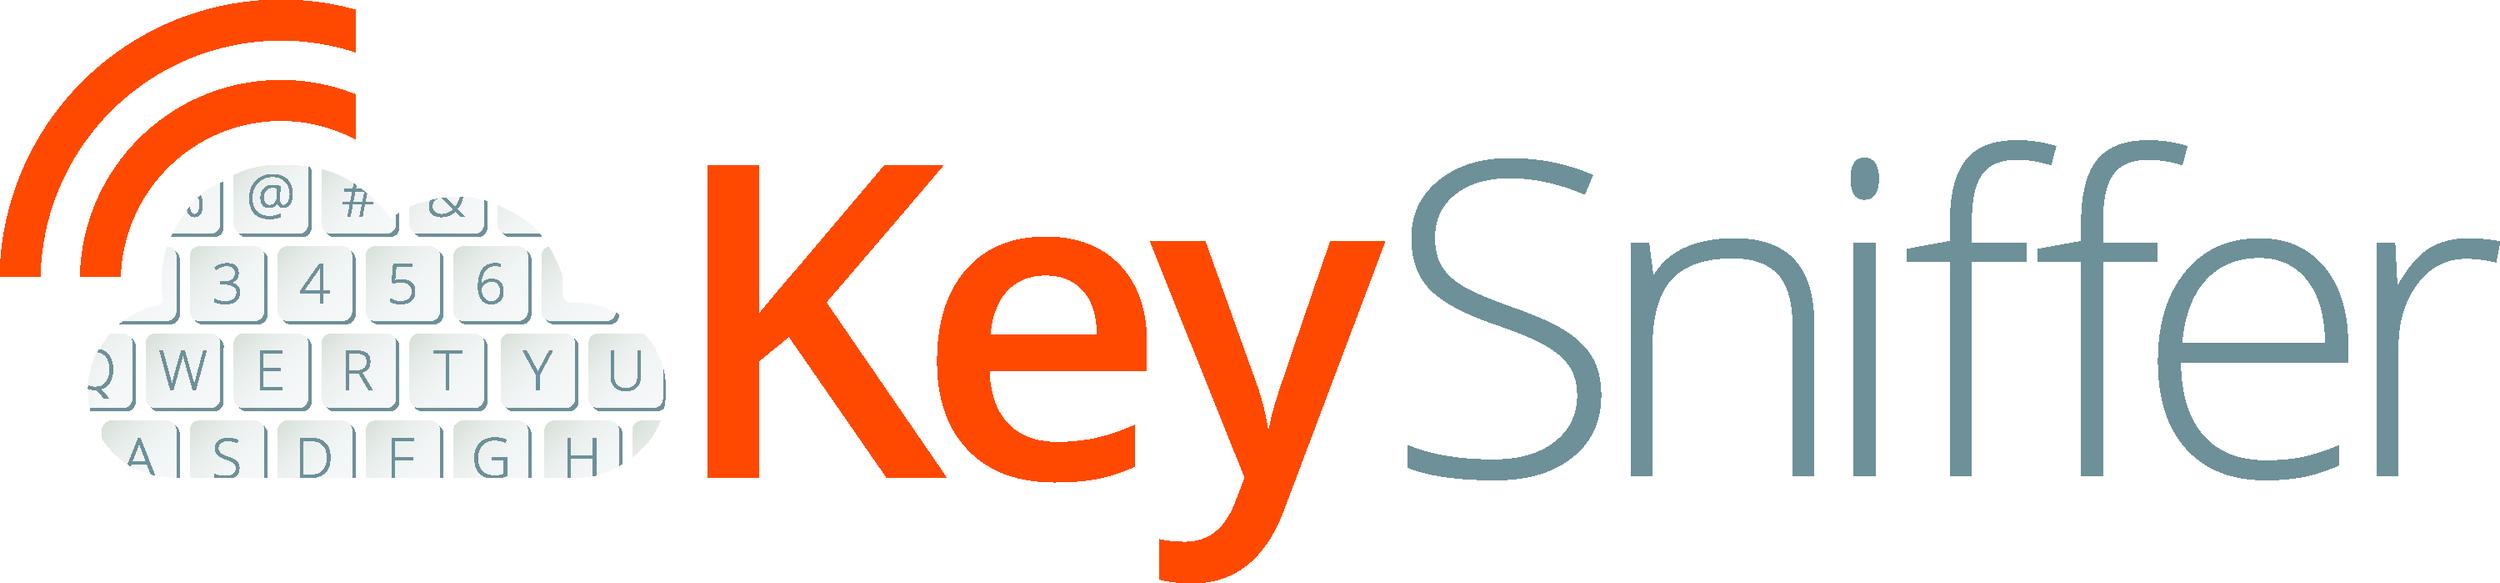 KeySniffer logo